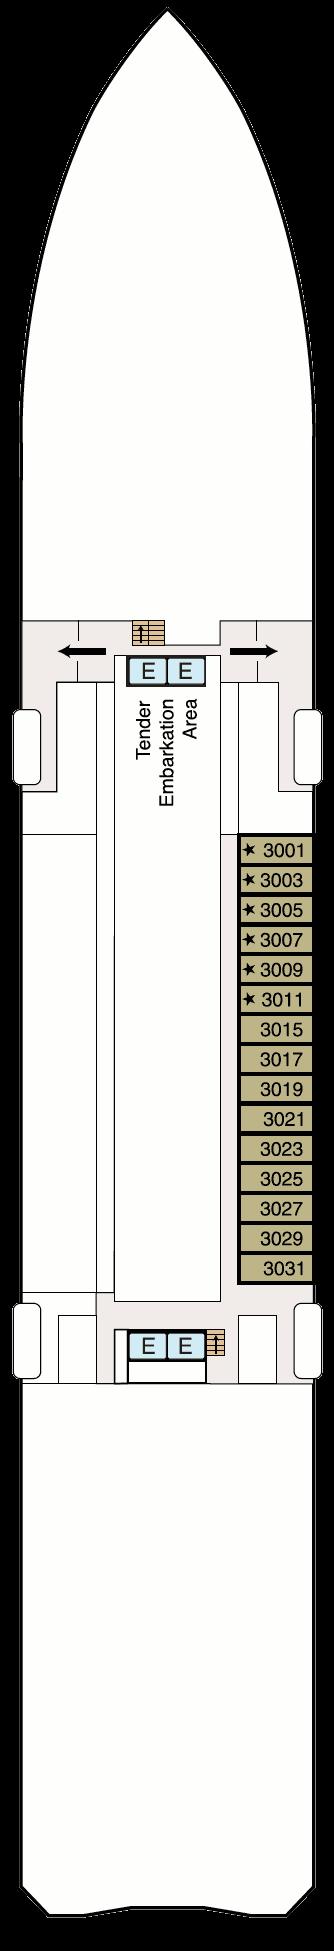 Deck 3